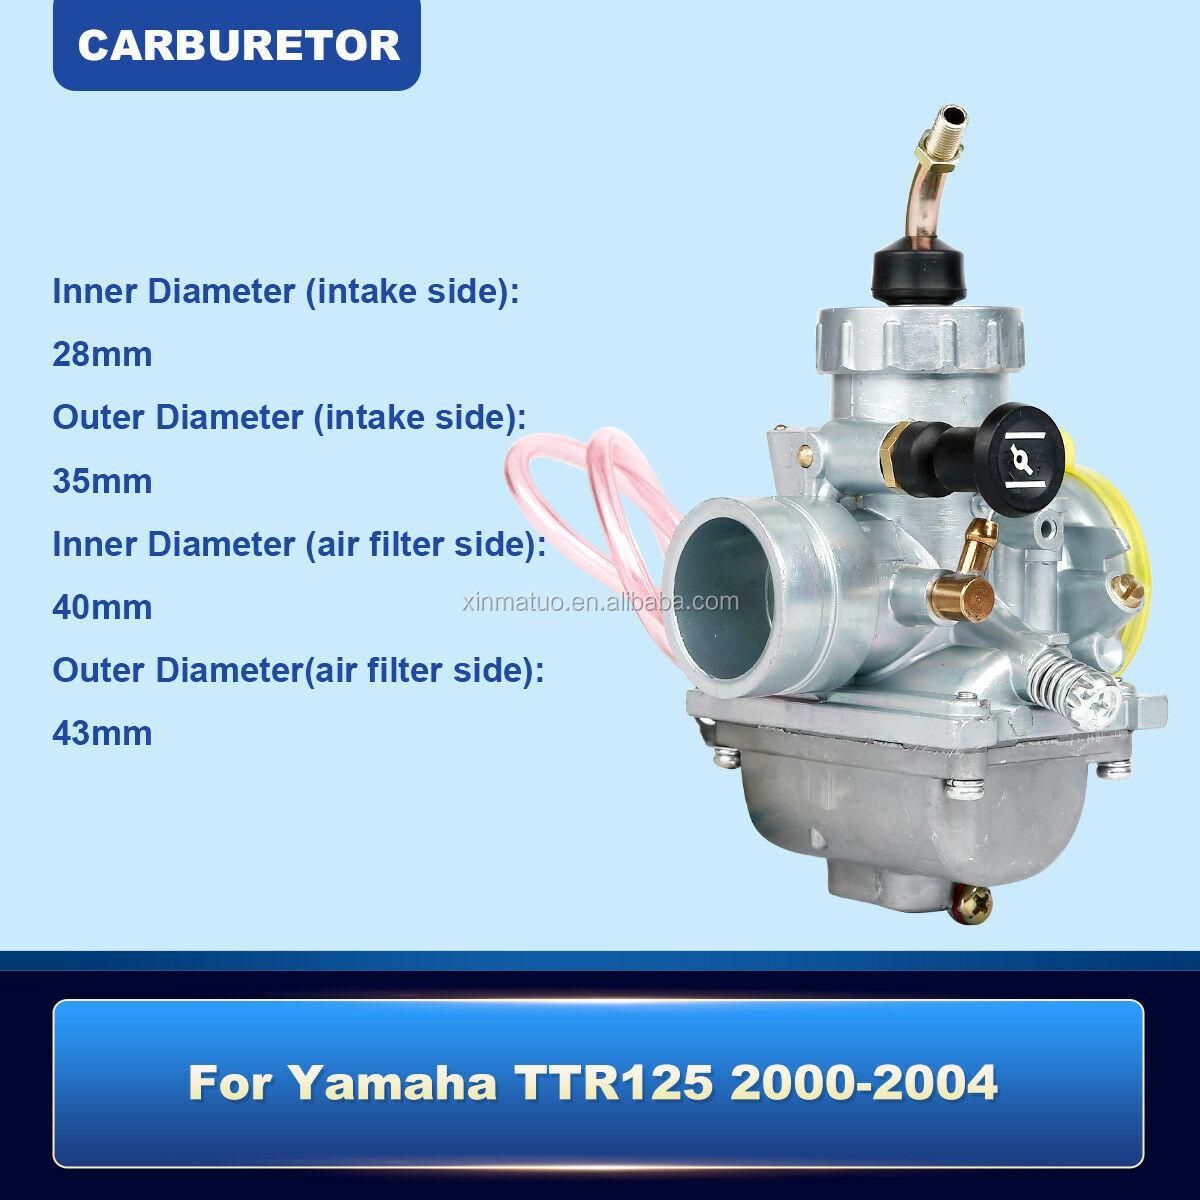 CARBURETOR YAMAHA TTR125 TTR 125 CARB 2000-2004